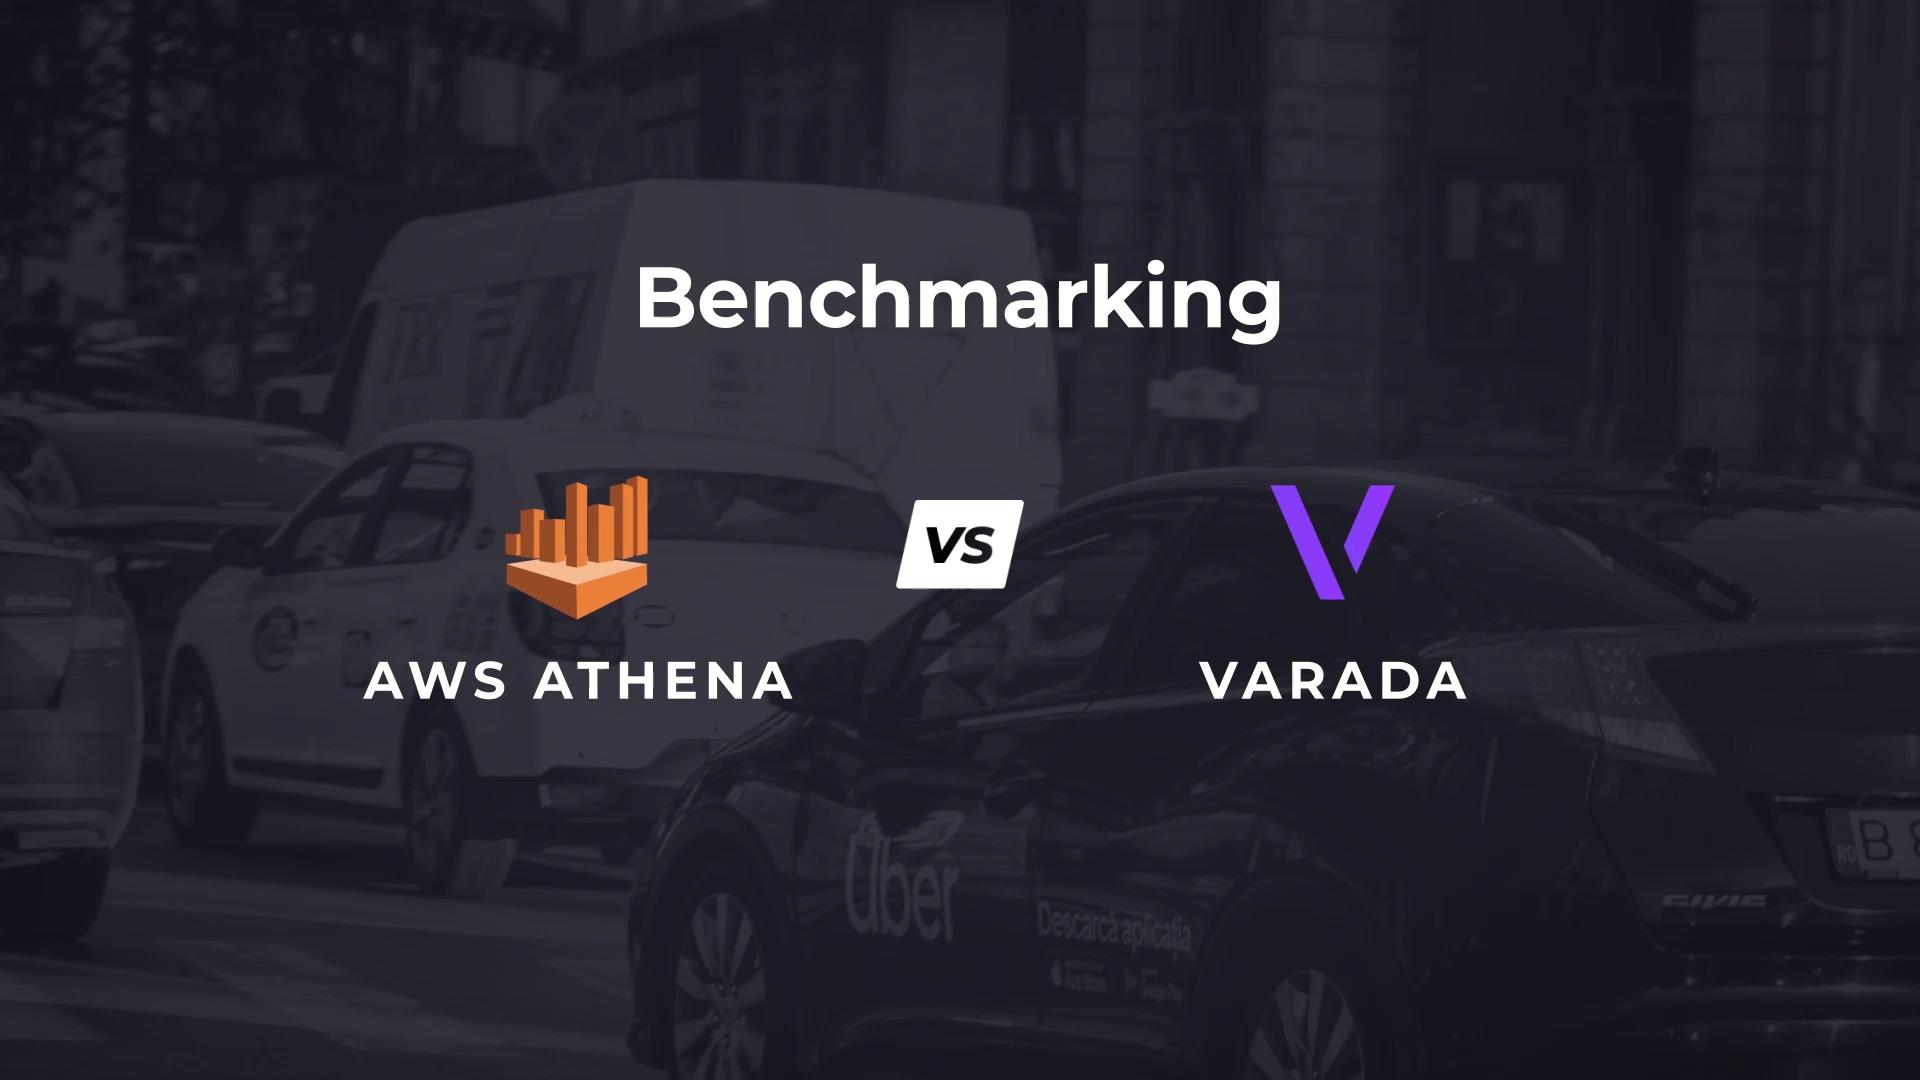 AWS Athena vs Varada (Benchmarking)